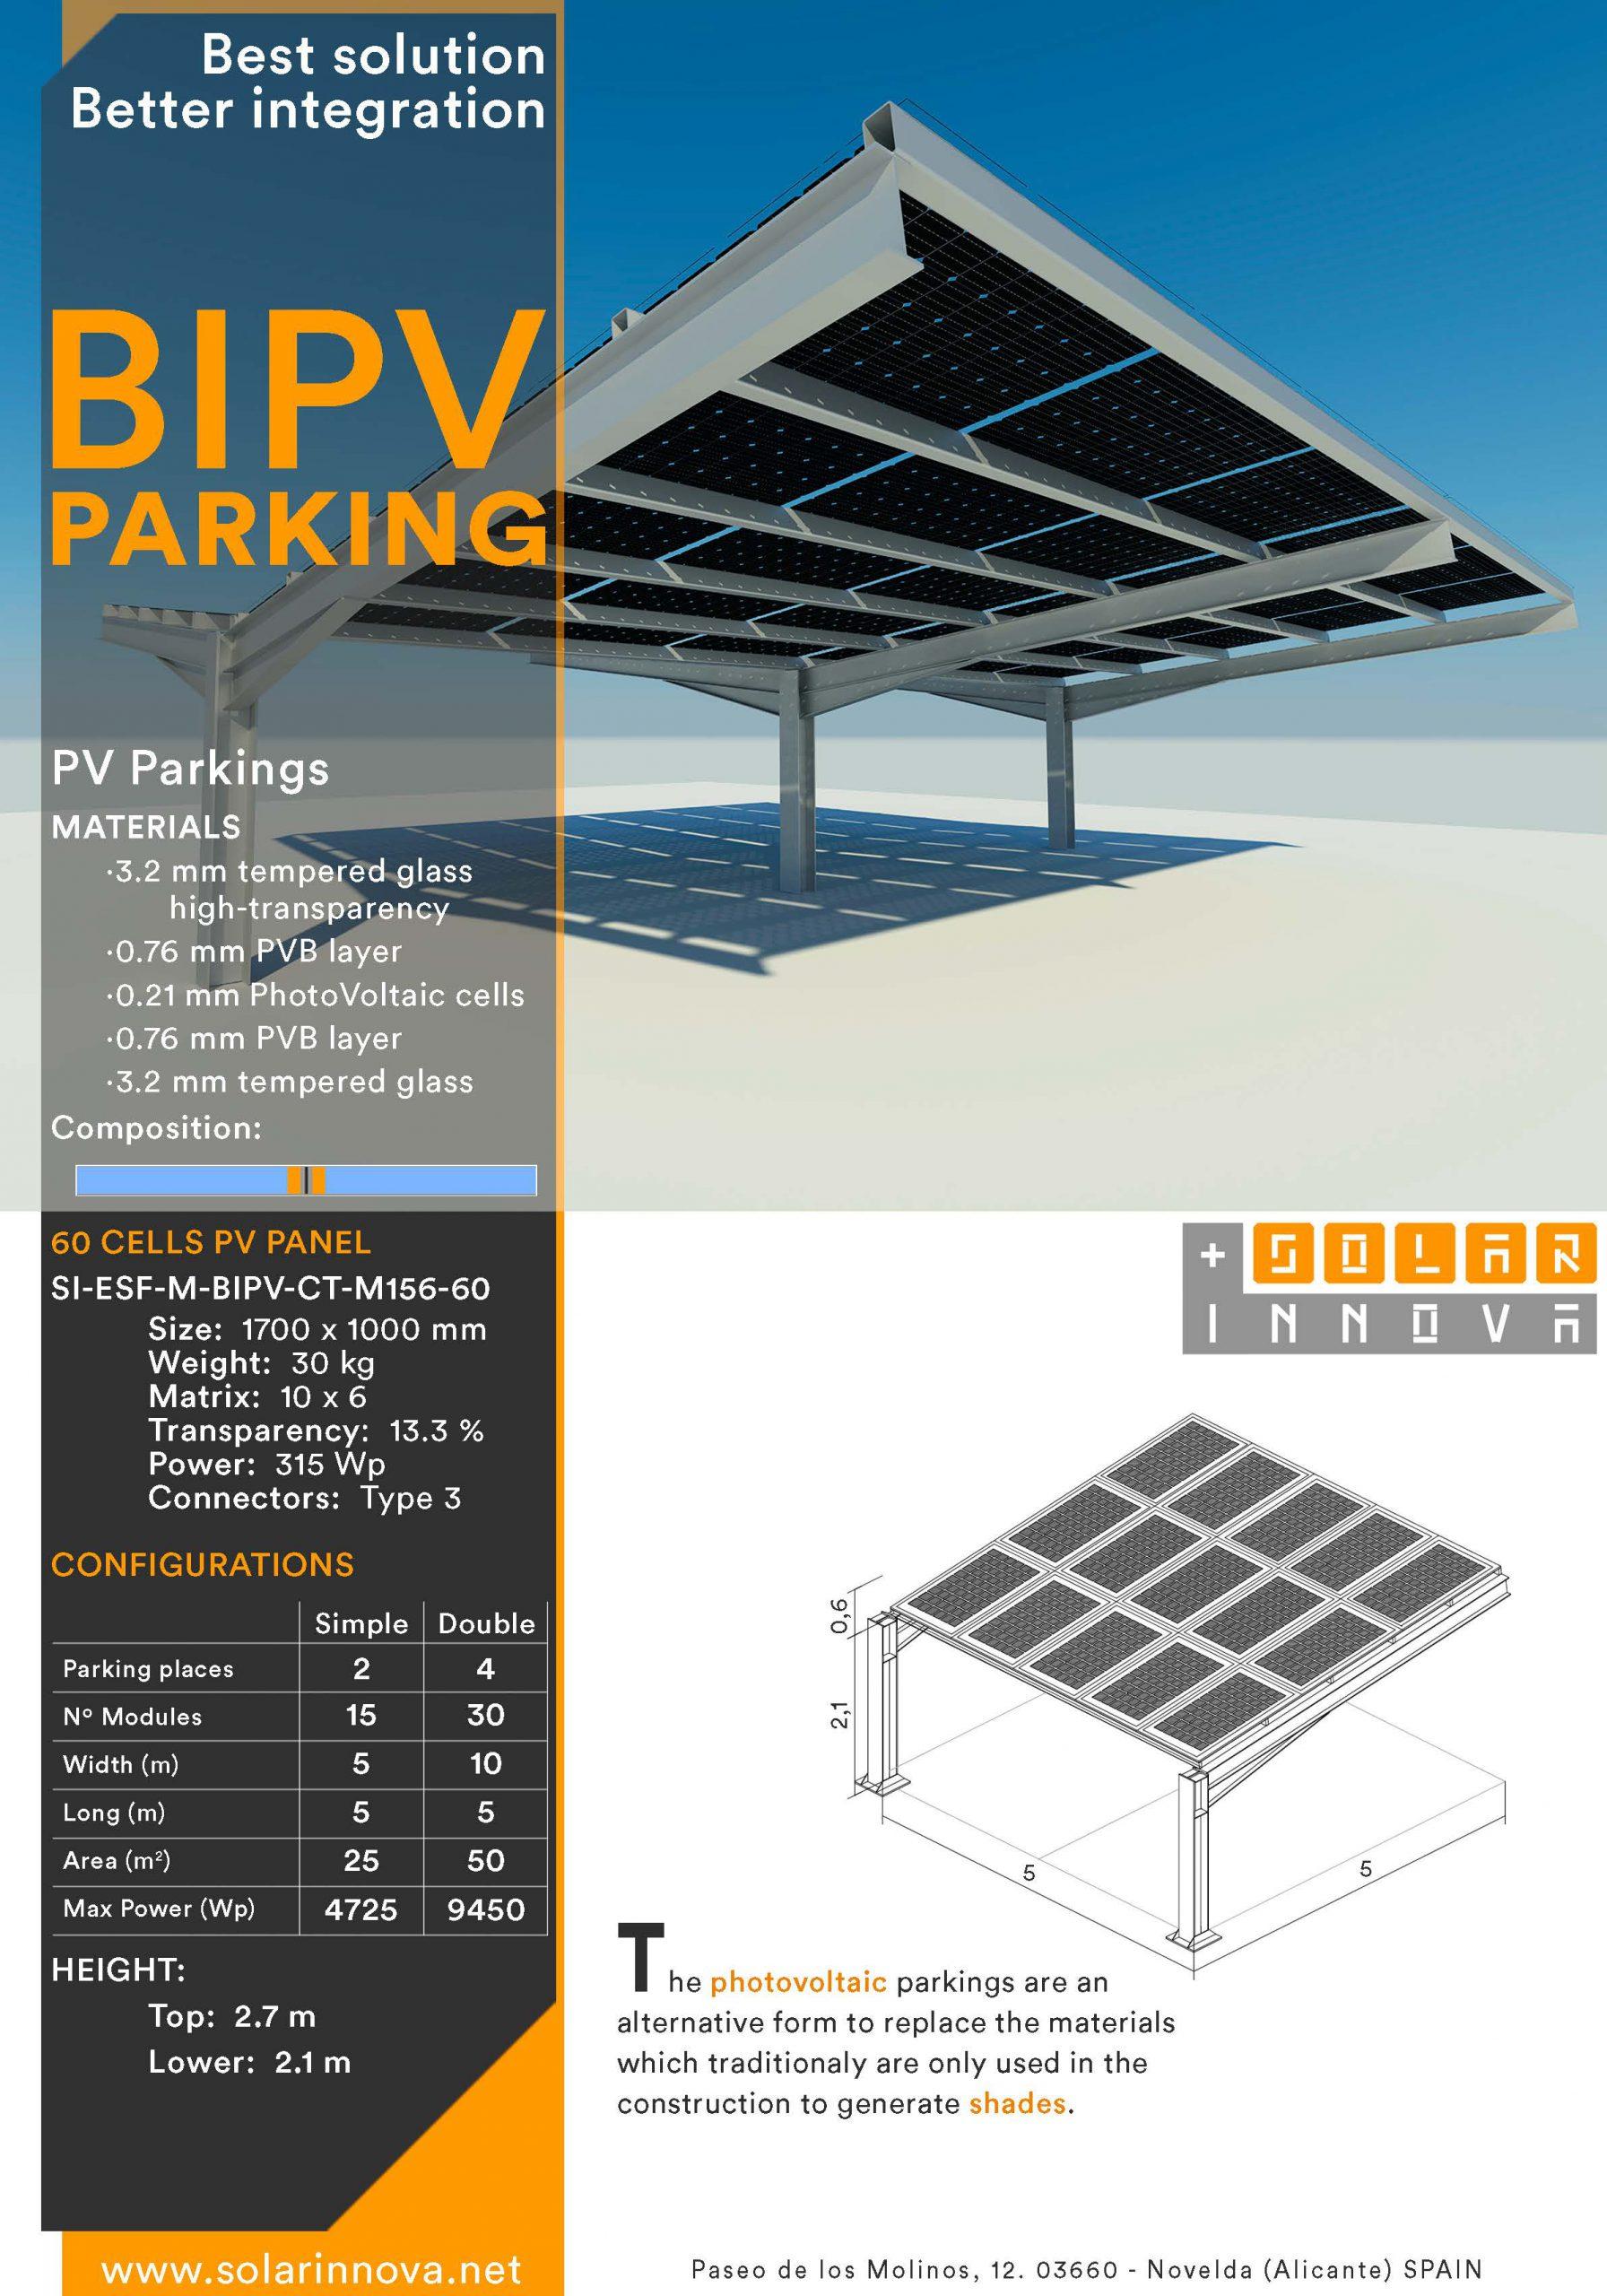 https://solarinnova.pl/wp-content/uploads/2021/04/katalog-2021-bipv-parking-en_Strona_1-scaled.jpg